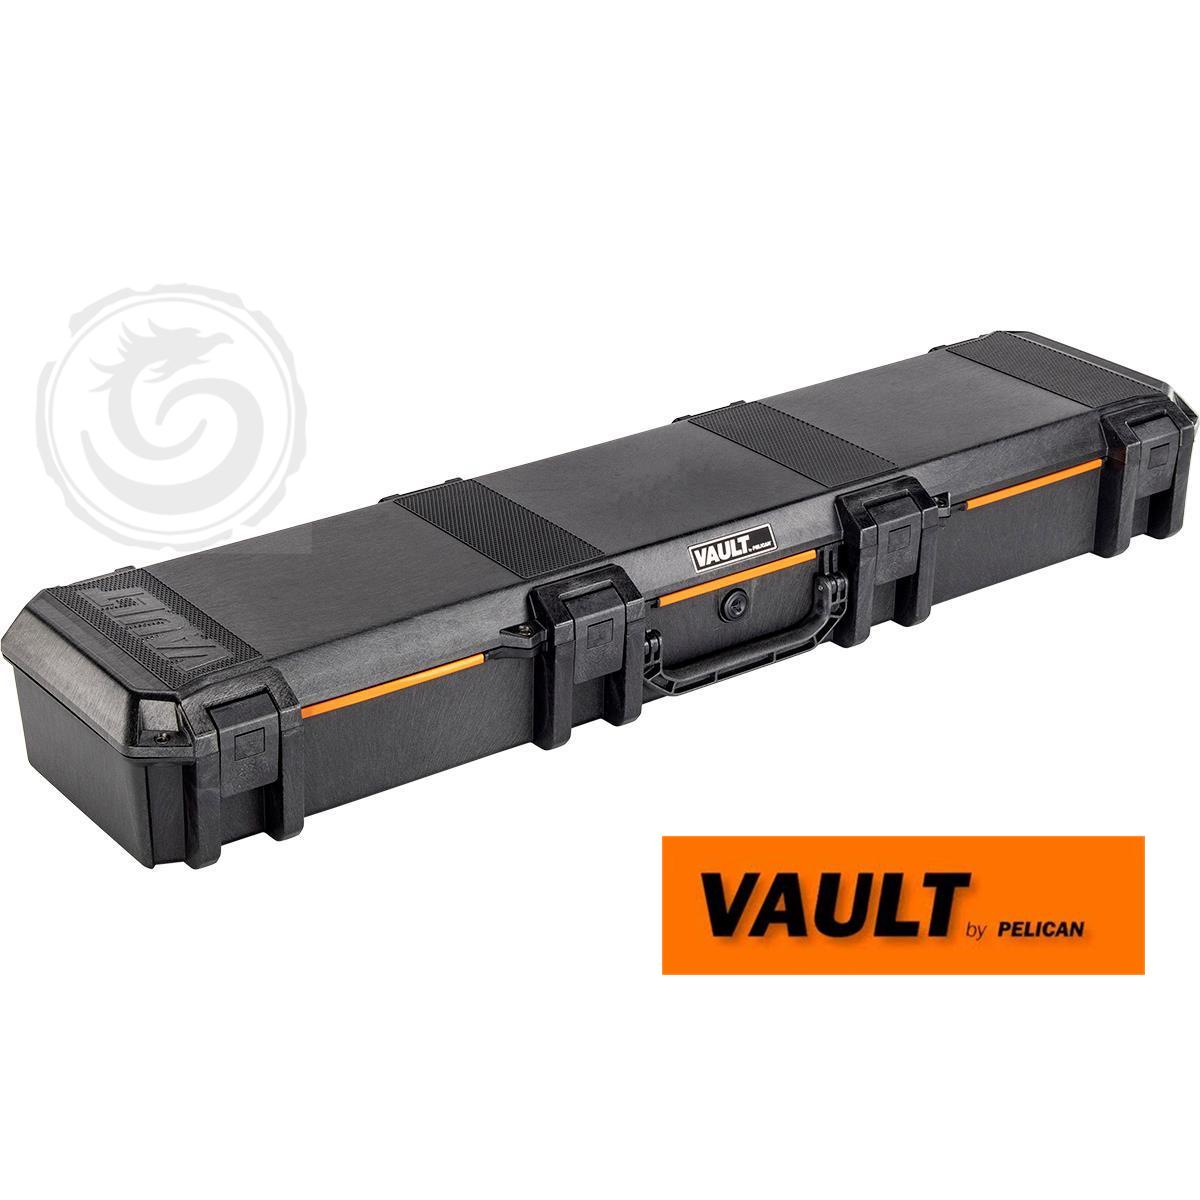 0009501_pelican-vault-v770-single-rifle-case